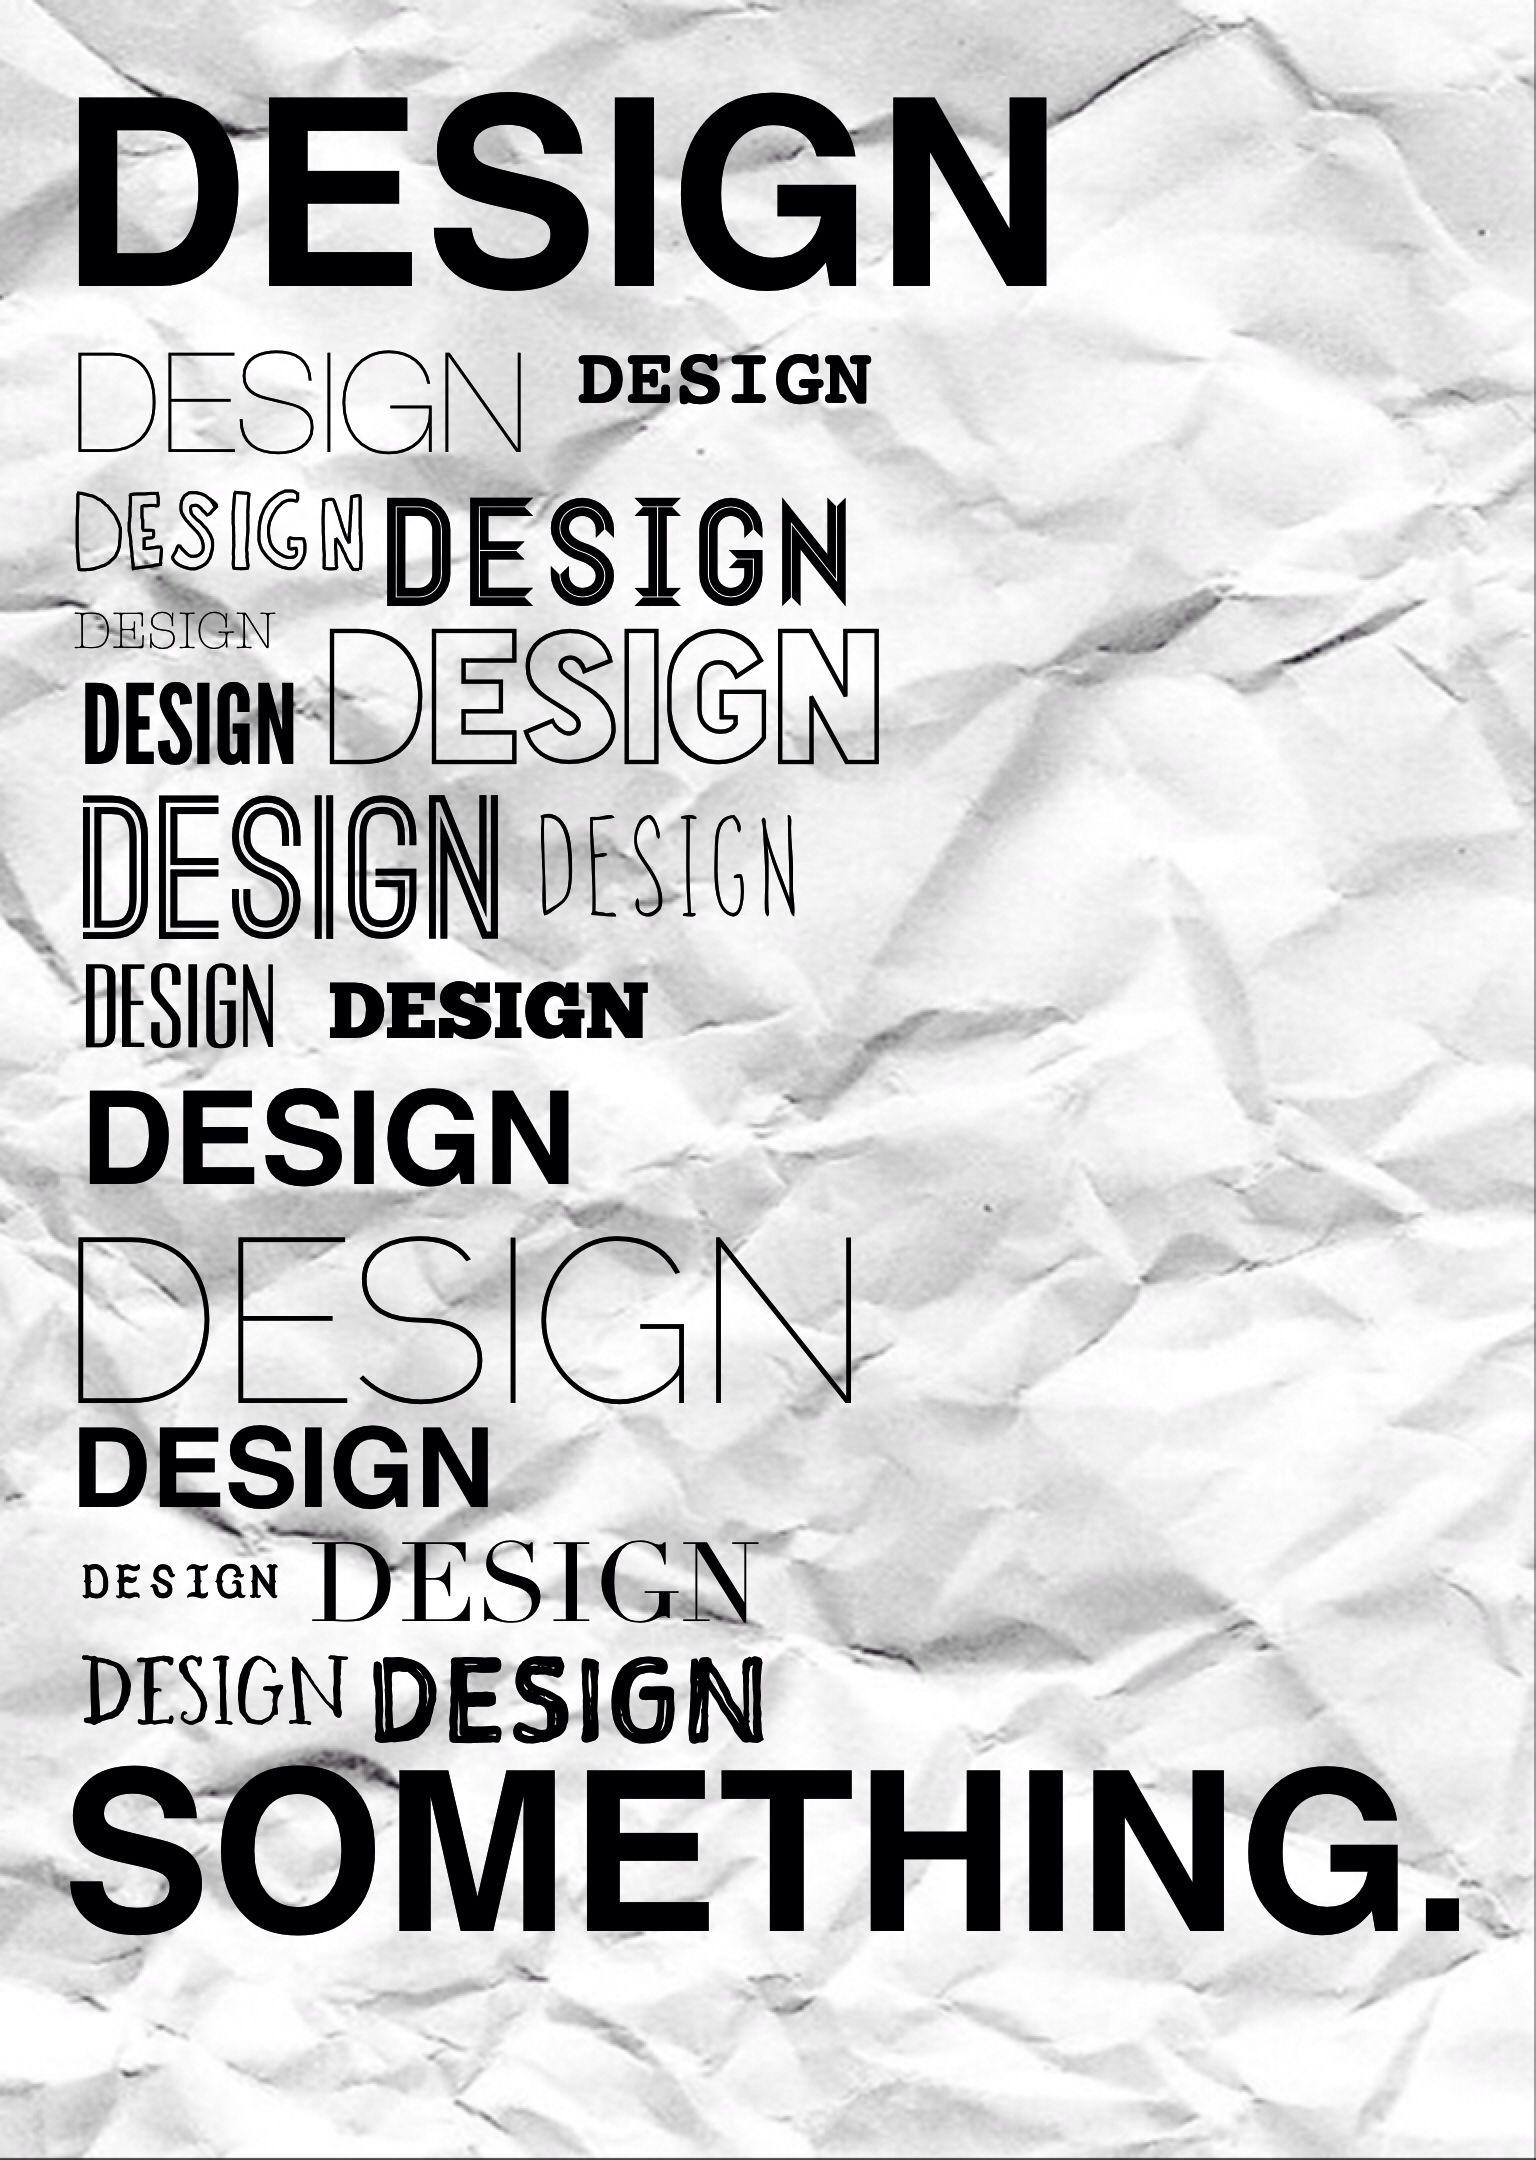 Pin by matt pate on logos calm artwork design keep